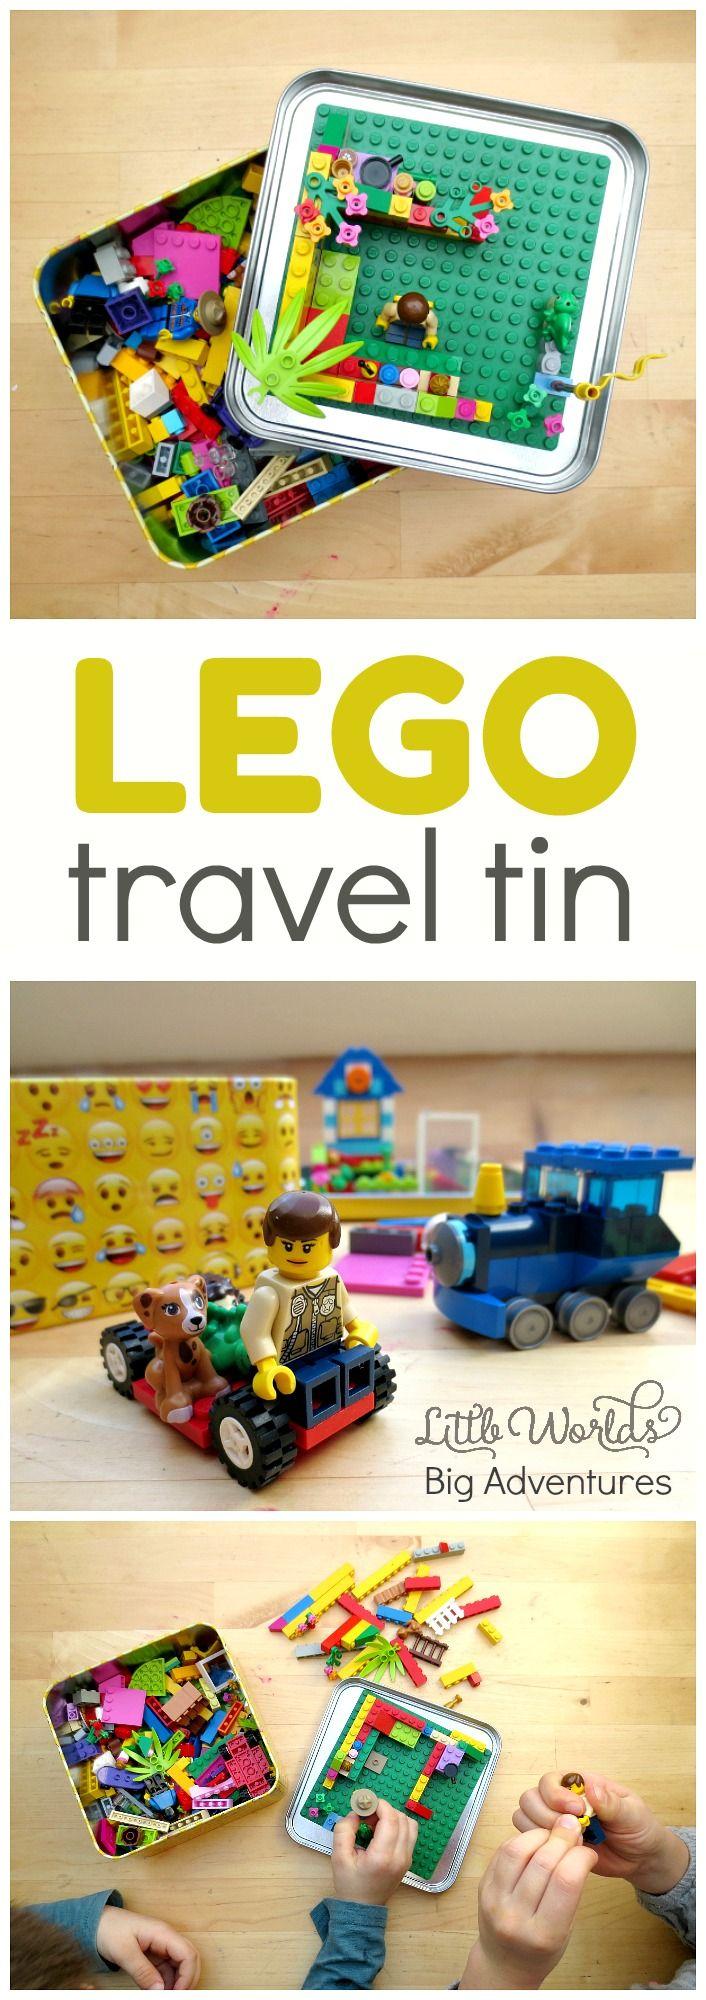 Top tips for putting together a LEGO travel tin.   Little Worlds Big Adventures #lego #traveltips #traveltin #creativity #kidsactivities